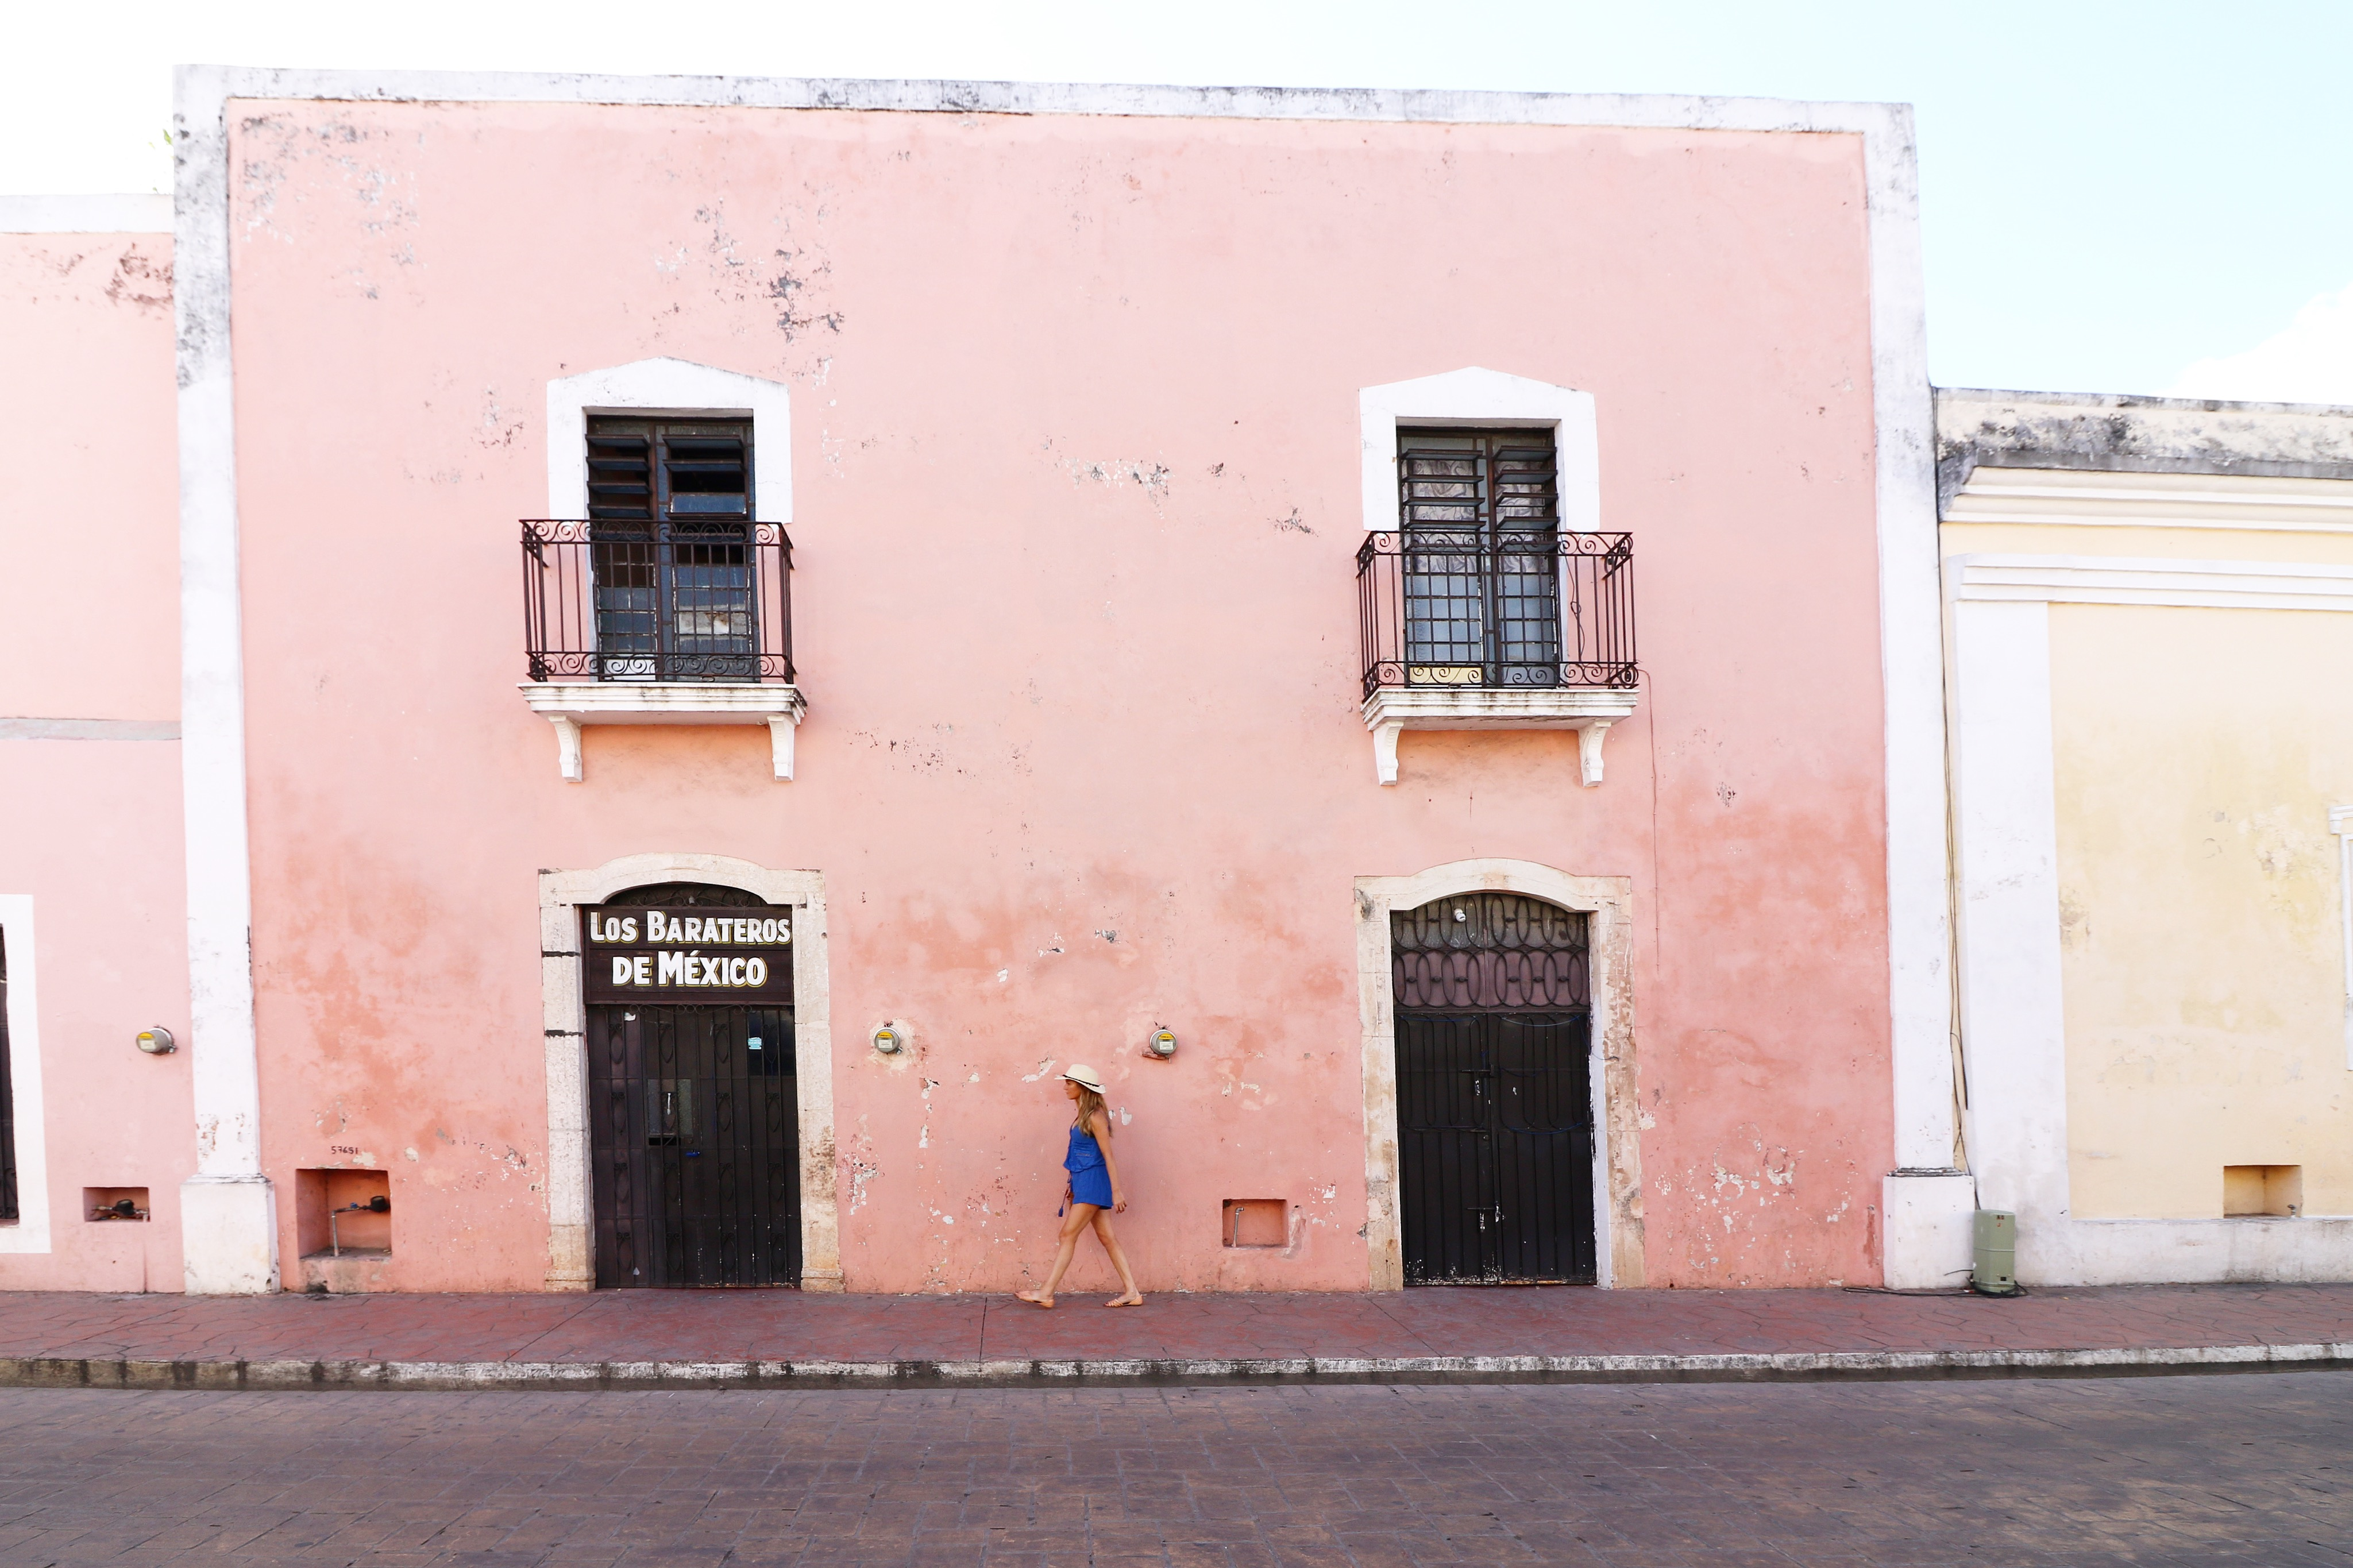 Vallolidad city